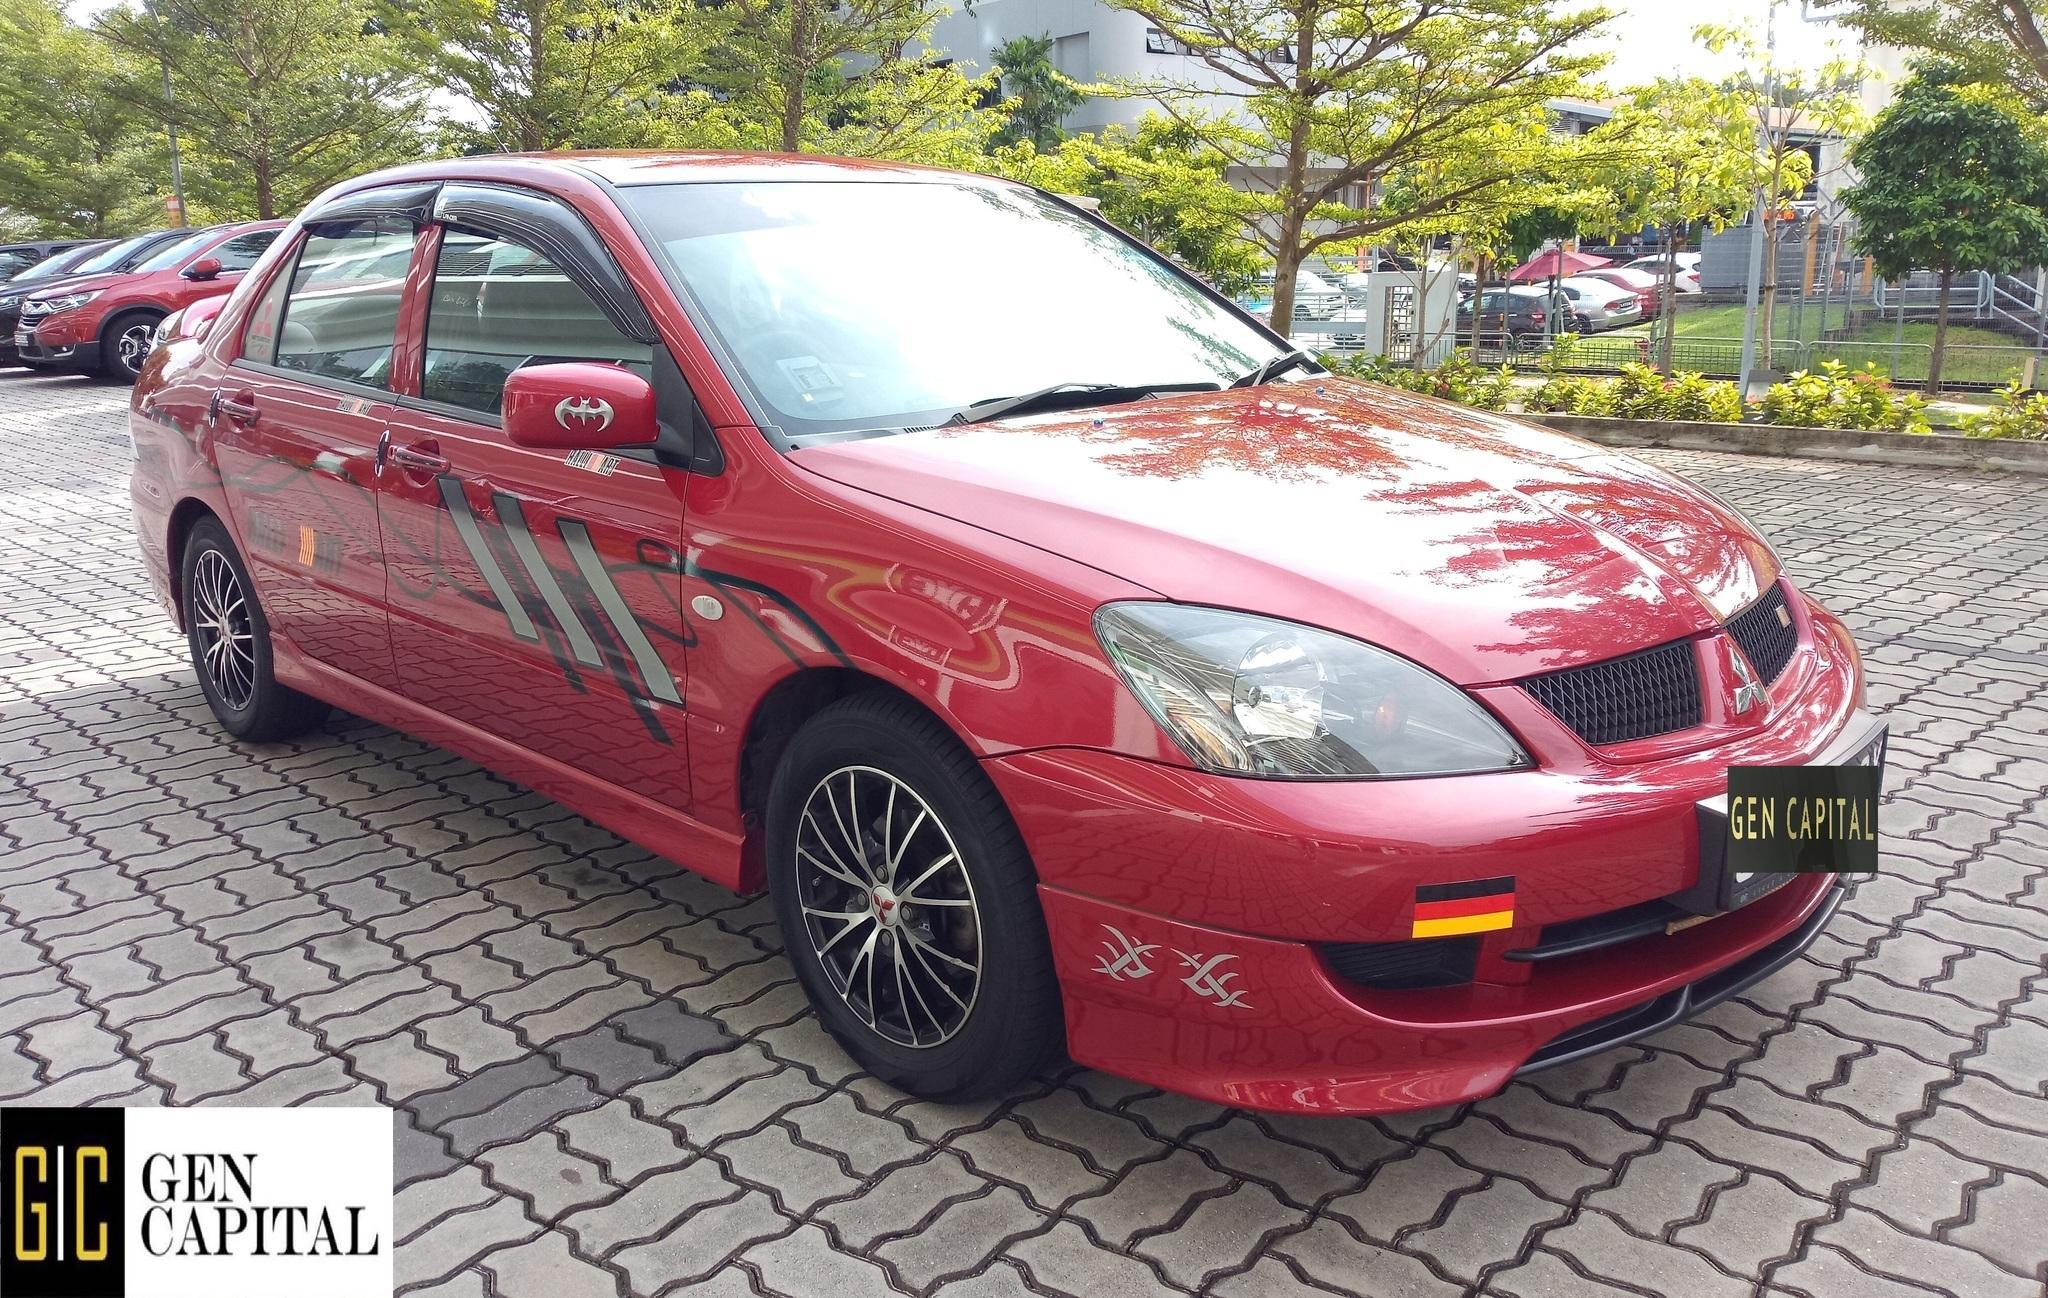 Mitsubishi Lancer GLX 1.6A Grab Gojek Ryde Tada & Non PHV Car Rental